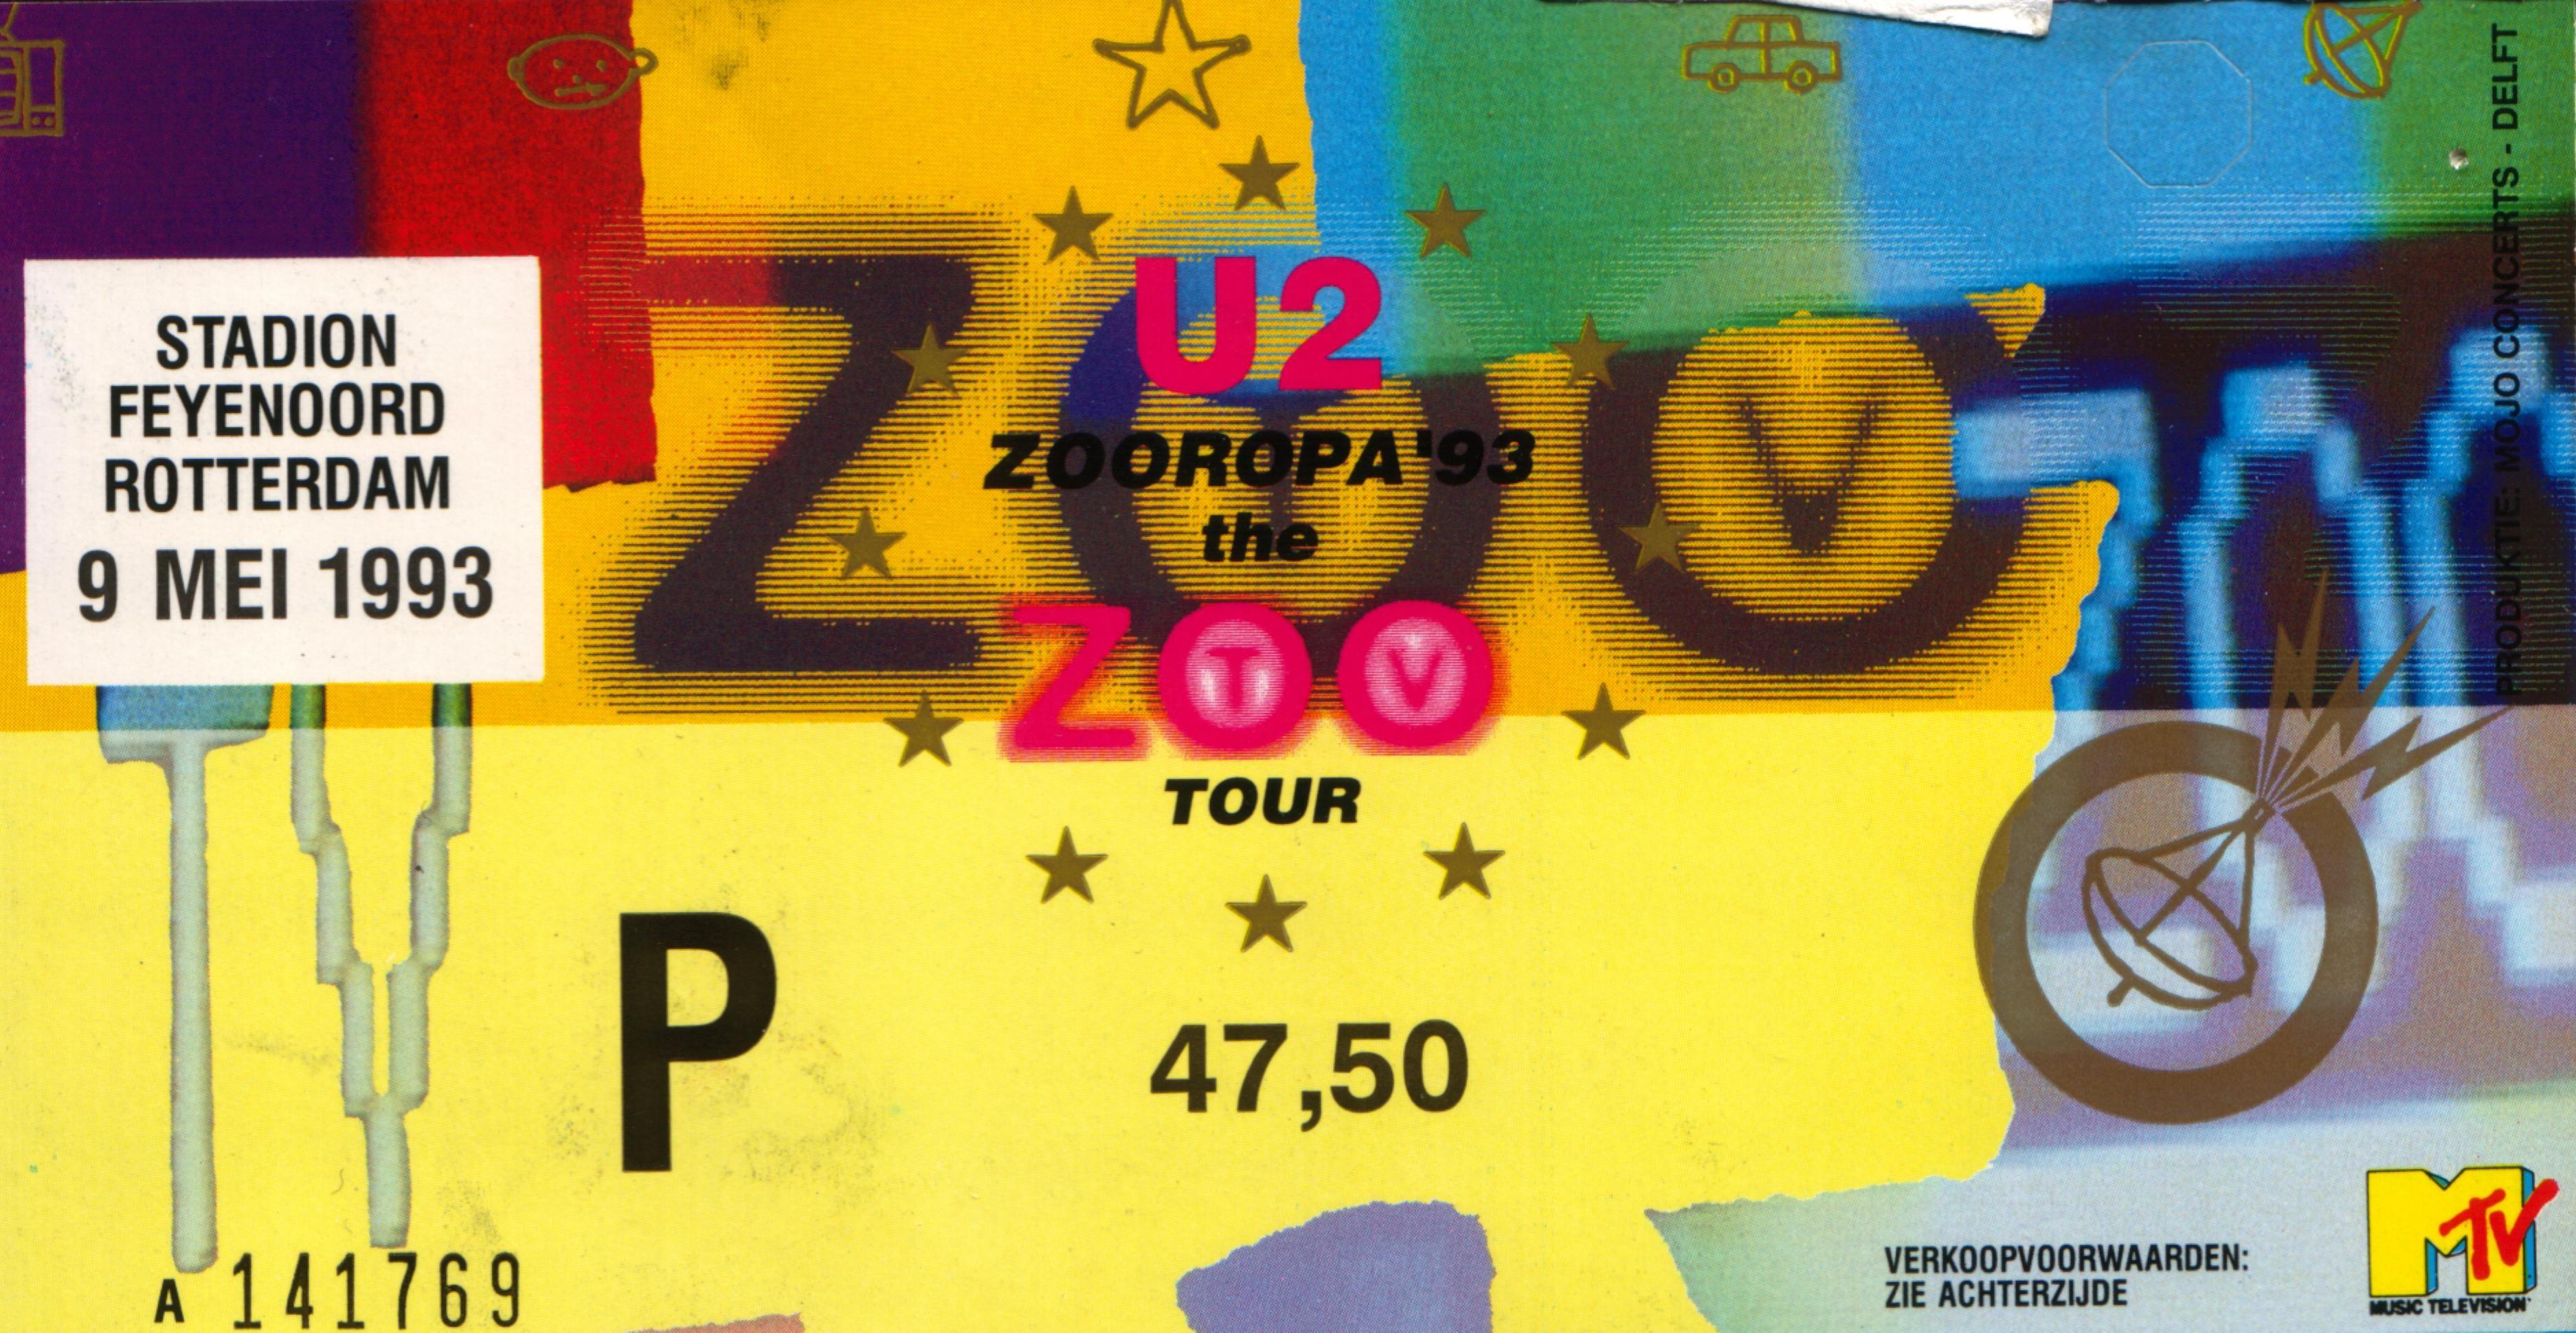 Ticket U2 Zooropa Tour Feyenoord Stadium Rotterdam Holland May